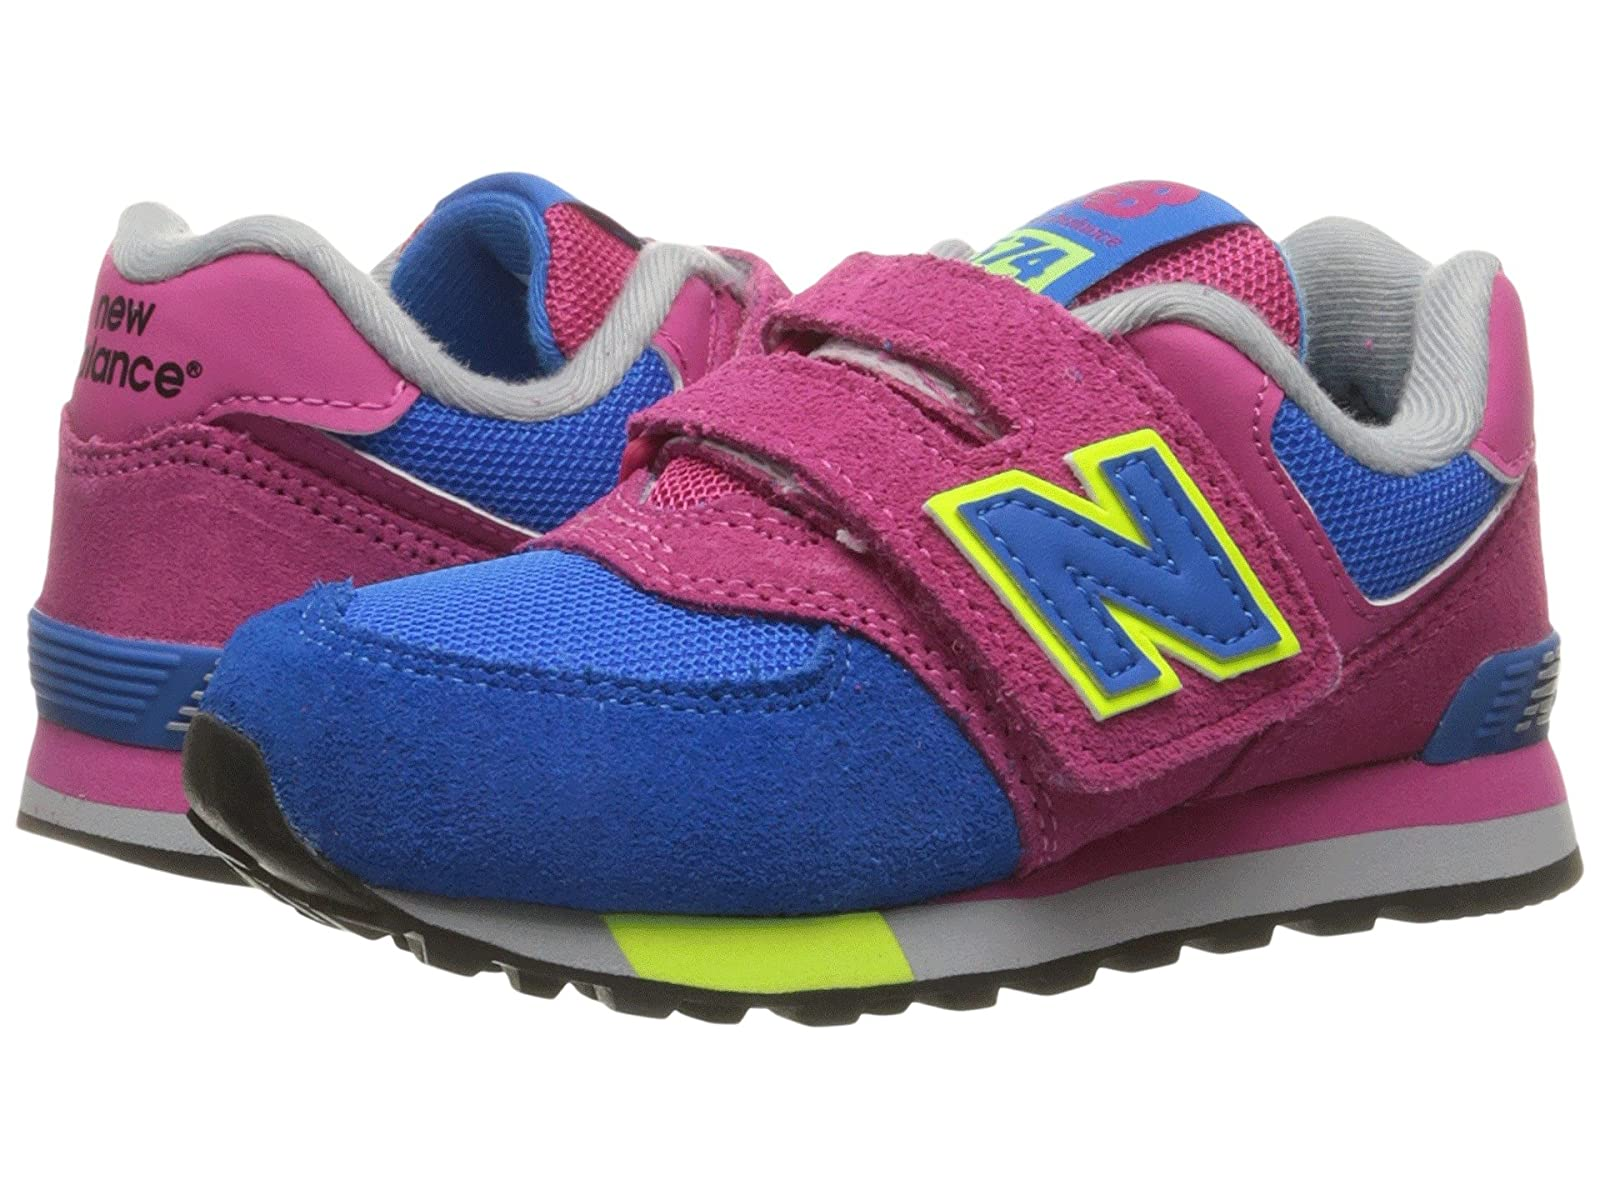 New Balance Kids KV574v1 Cut & Paste (Little Kid/Big Kid)Cheap and distinctive eye-catching shoes